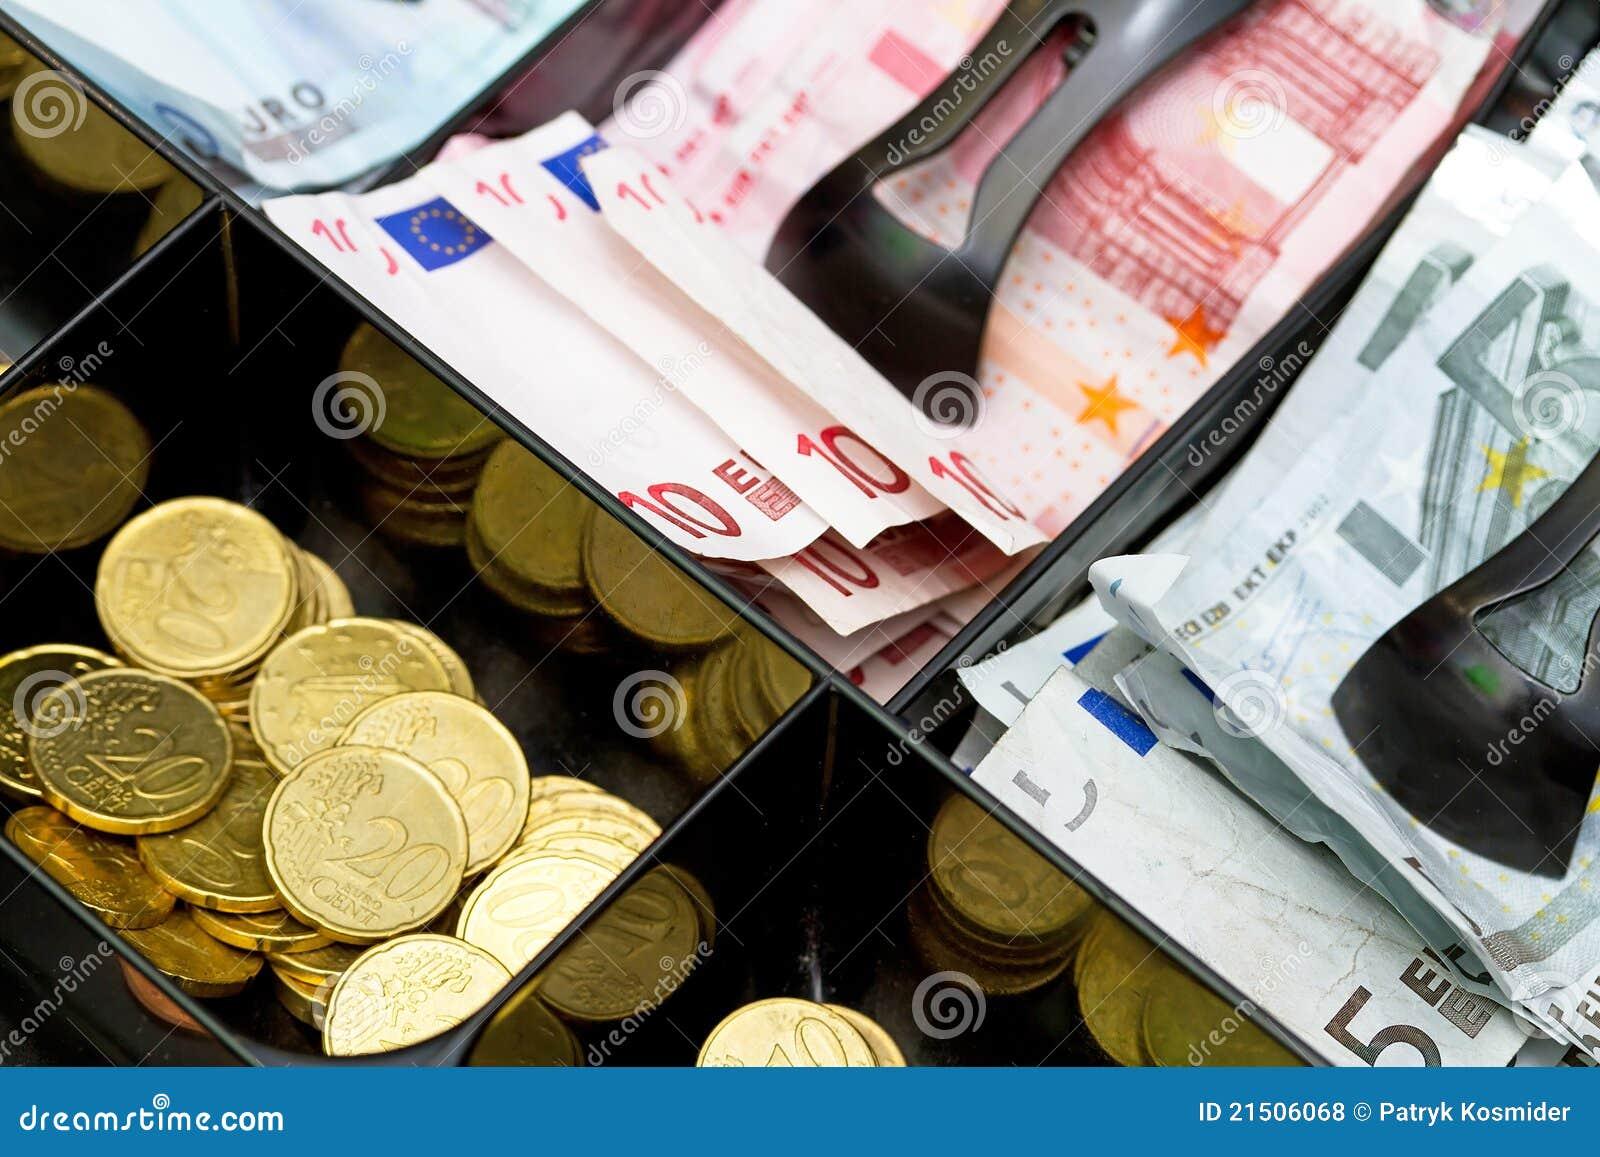 Dollar Till Euro Coupons Scam